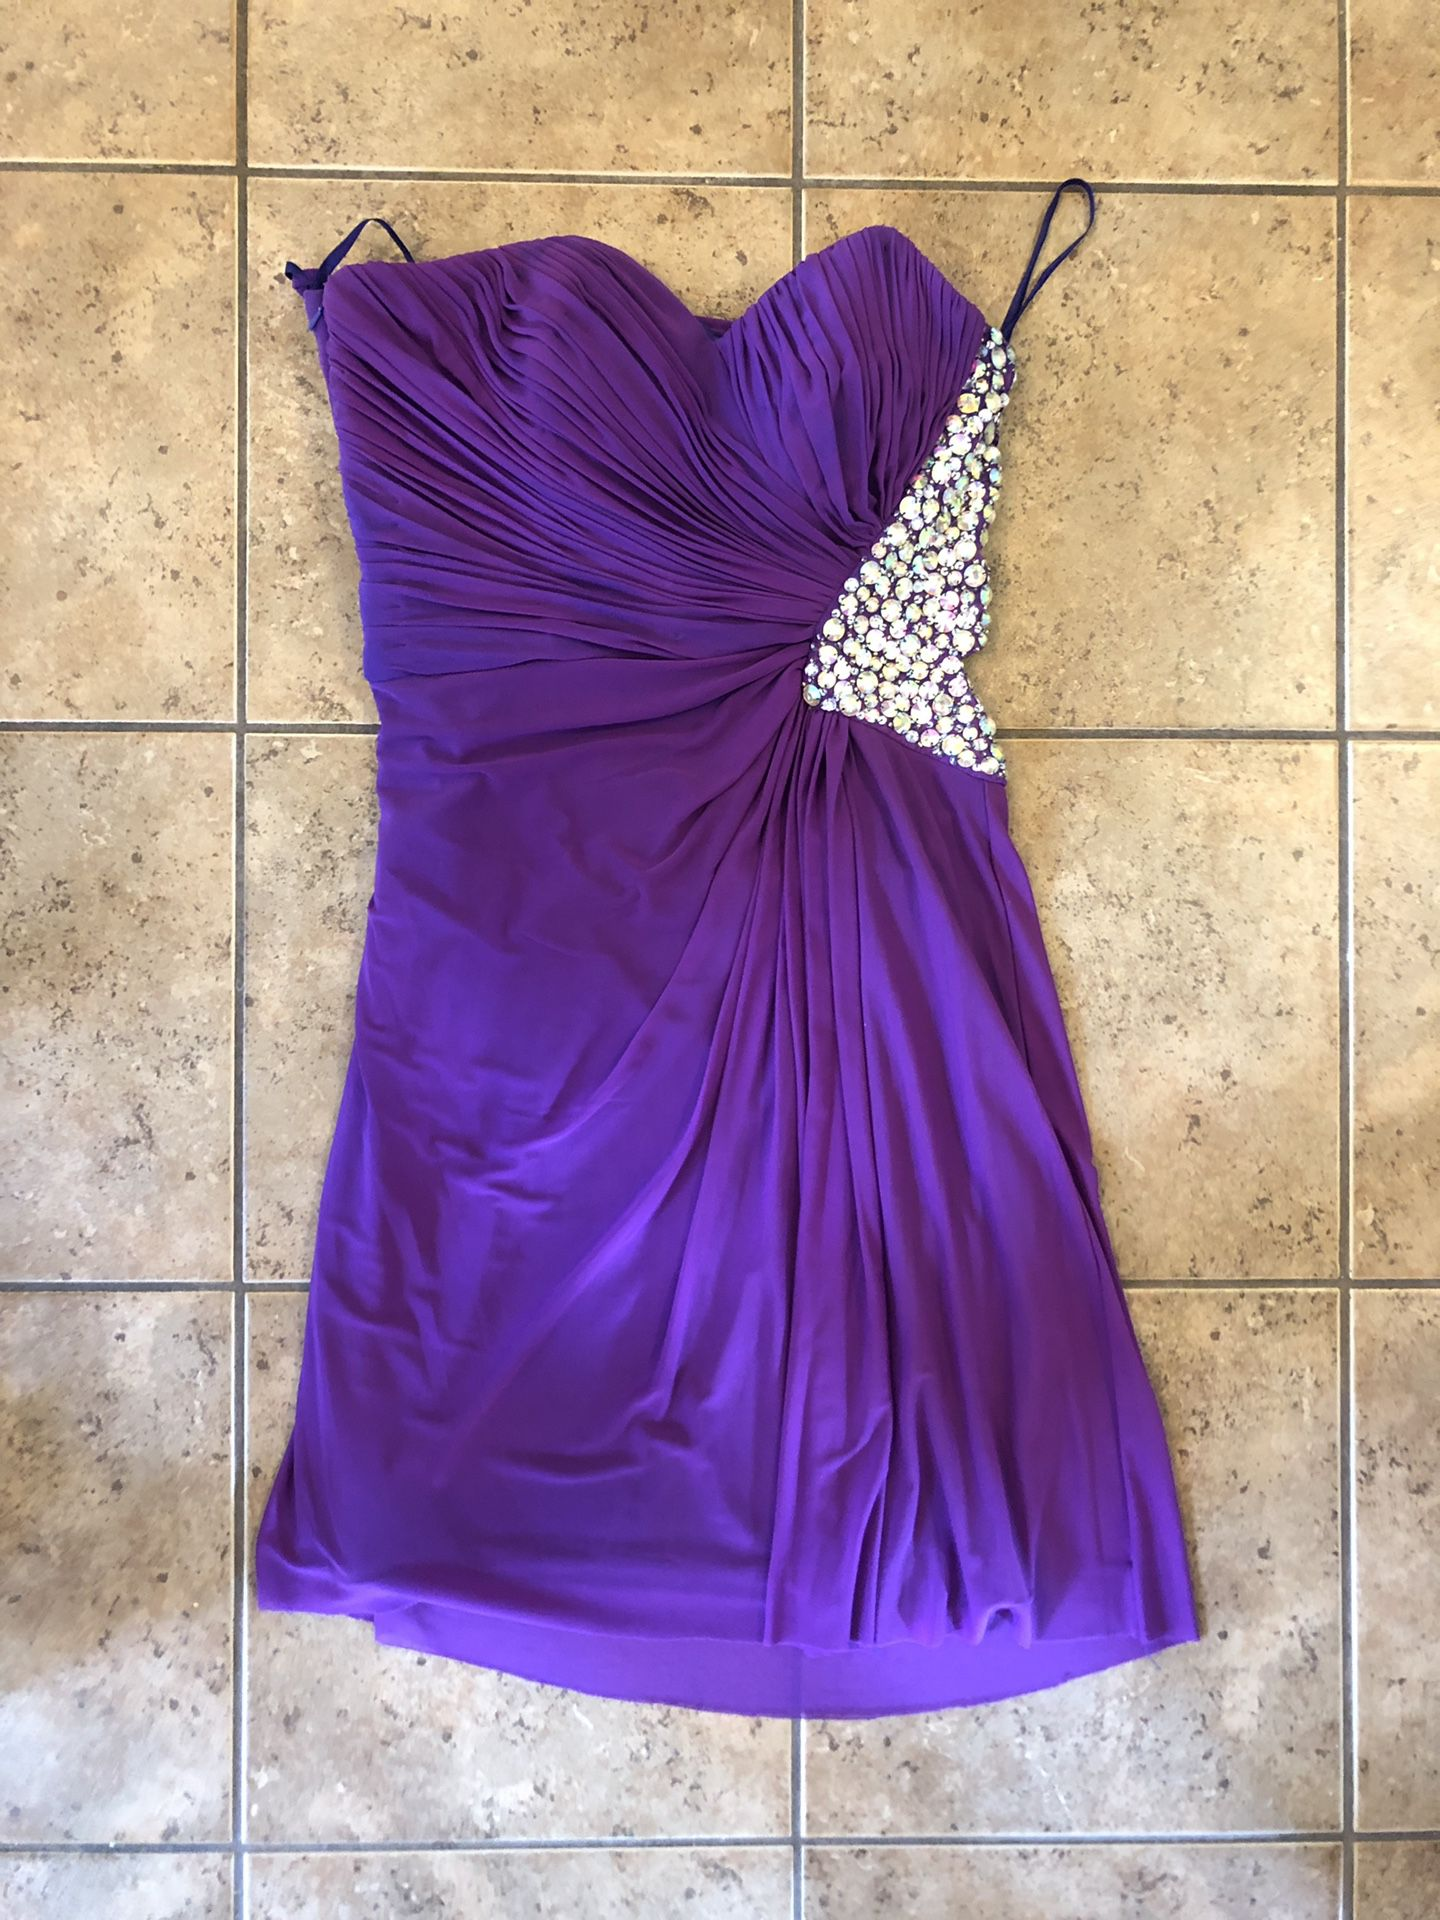 Homecoming dress - size 8